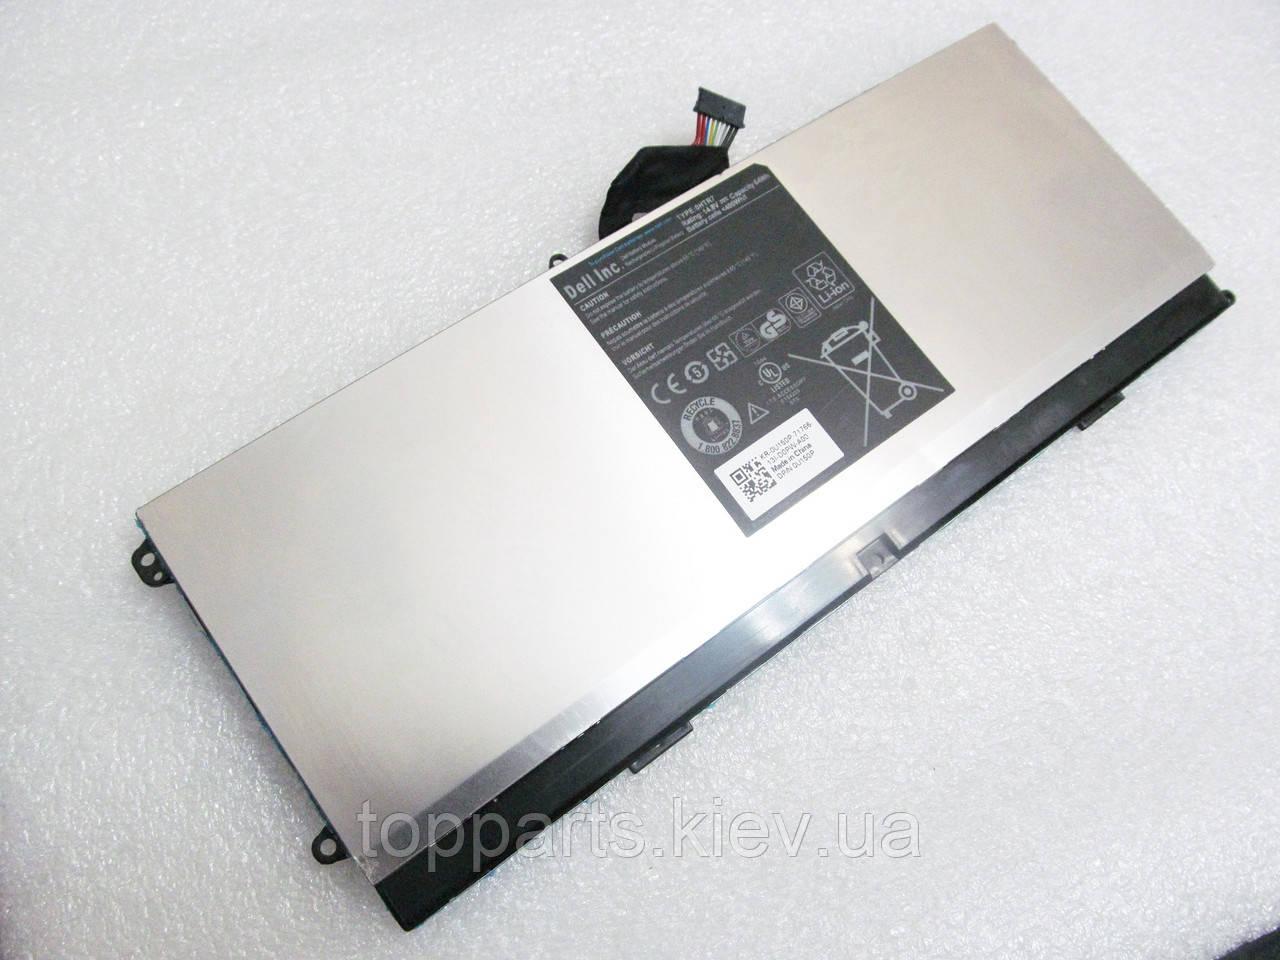 Батарея для ноутбука Dell XPS 15z (L511Z) 0HTR7, 64Wh (4000mAh), 8cell